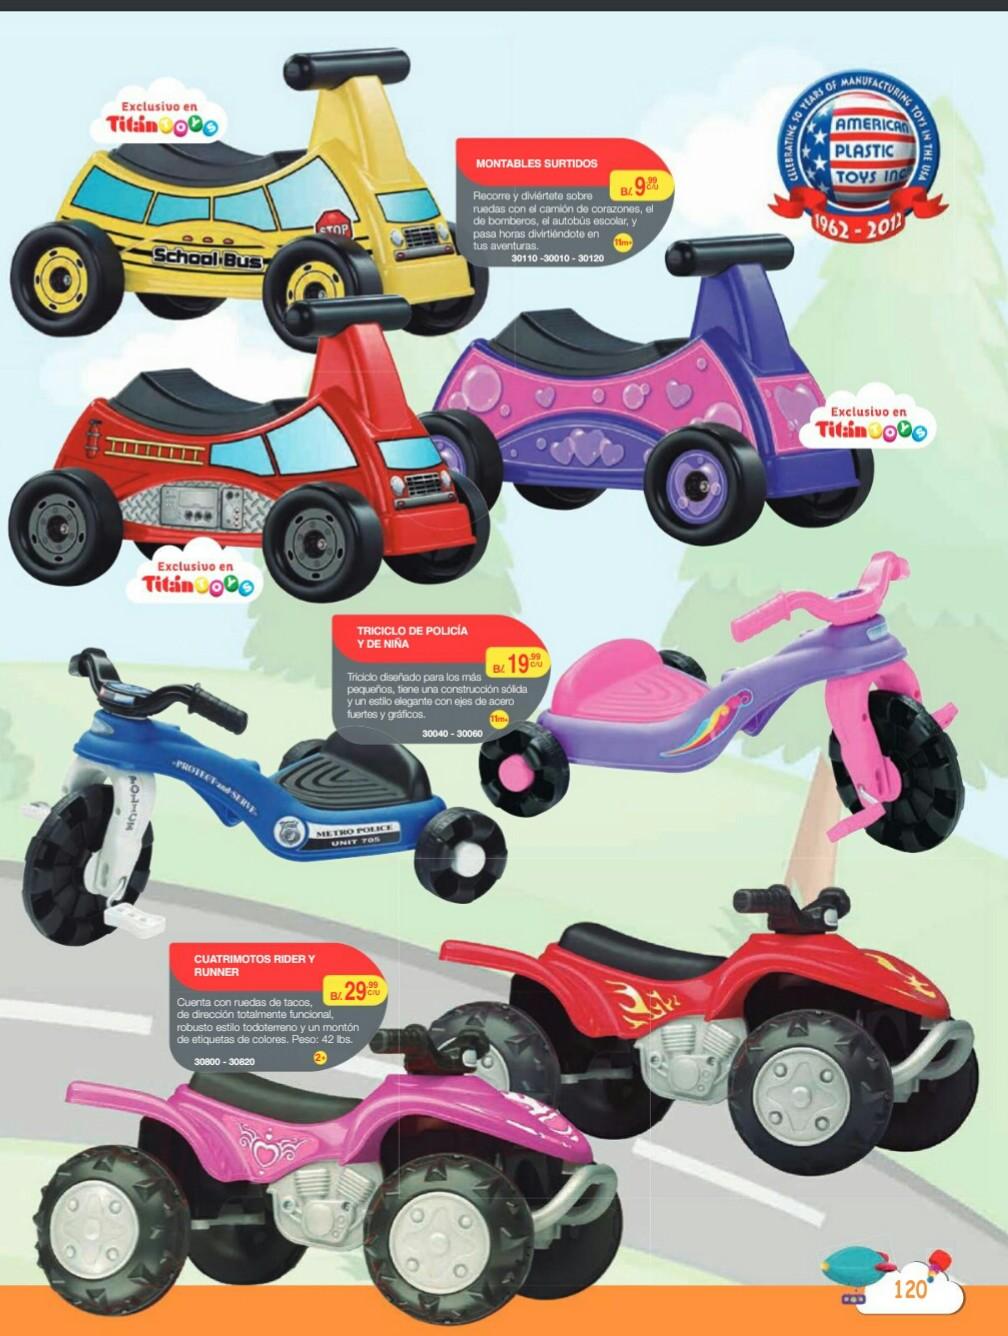 Catalogo juguetes Titan Toys 2018 p122